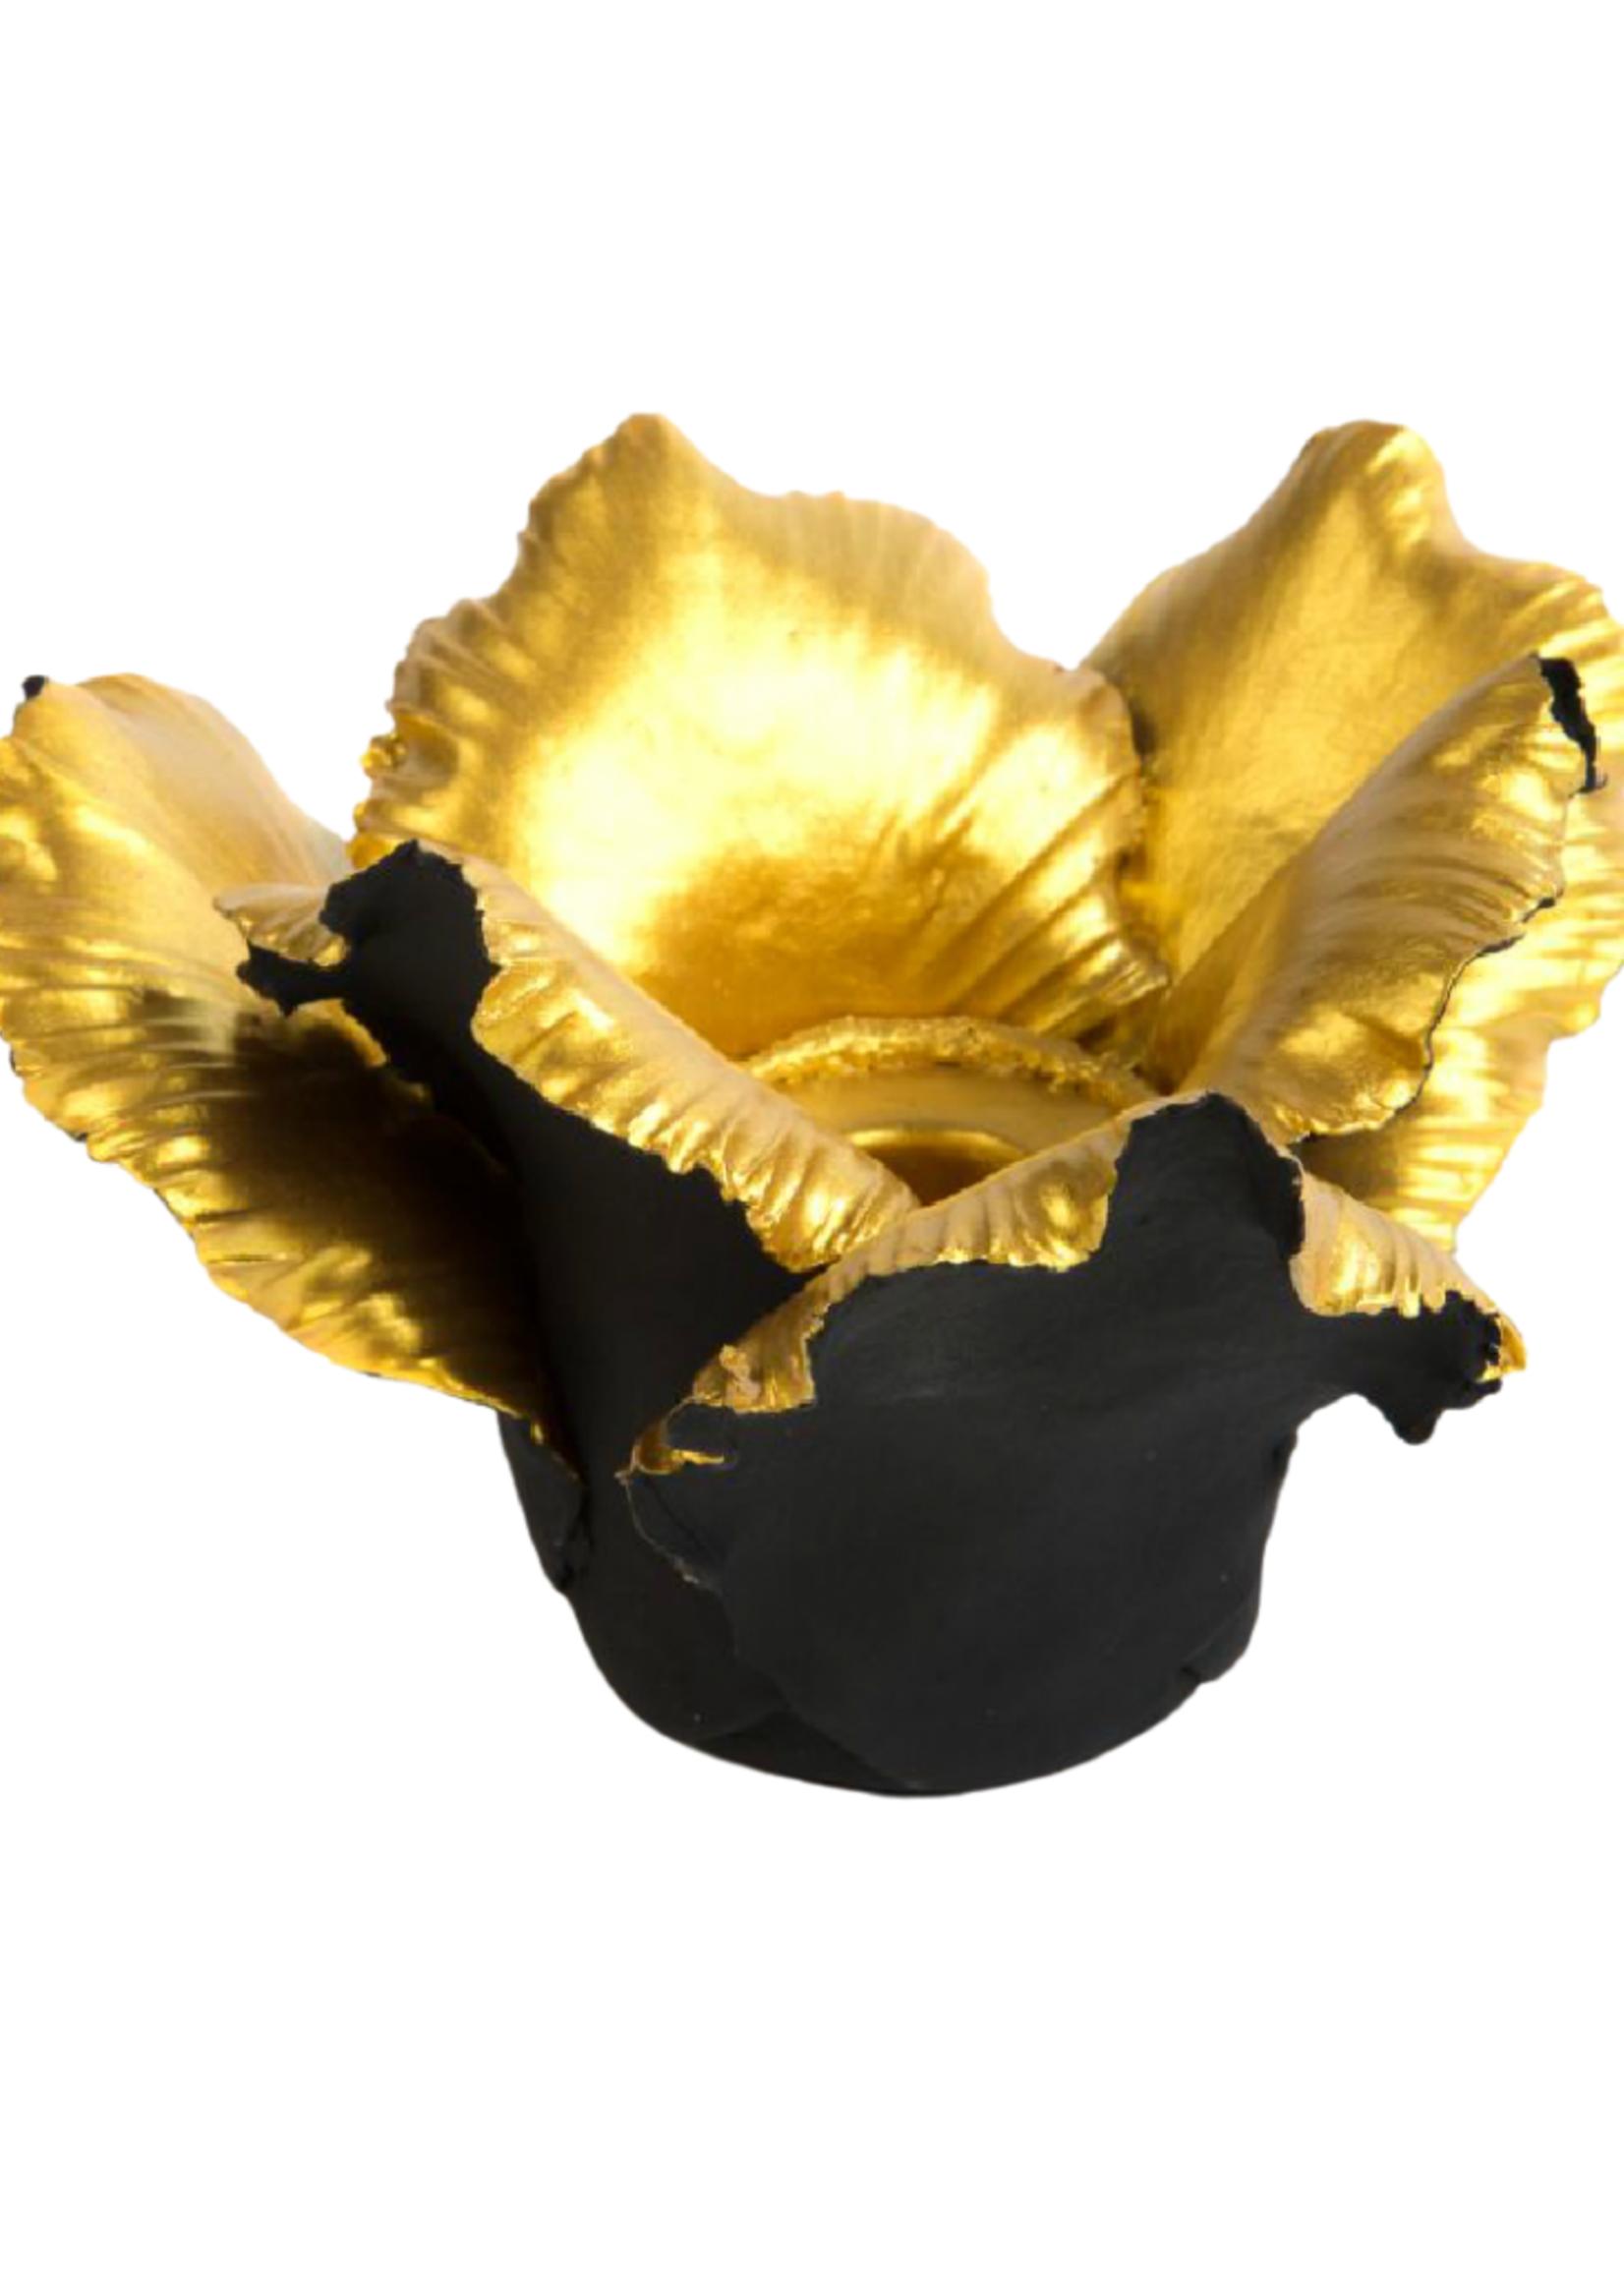 Daffodil Candle Holder // Black & Gold